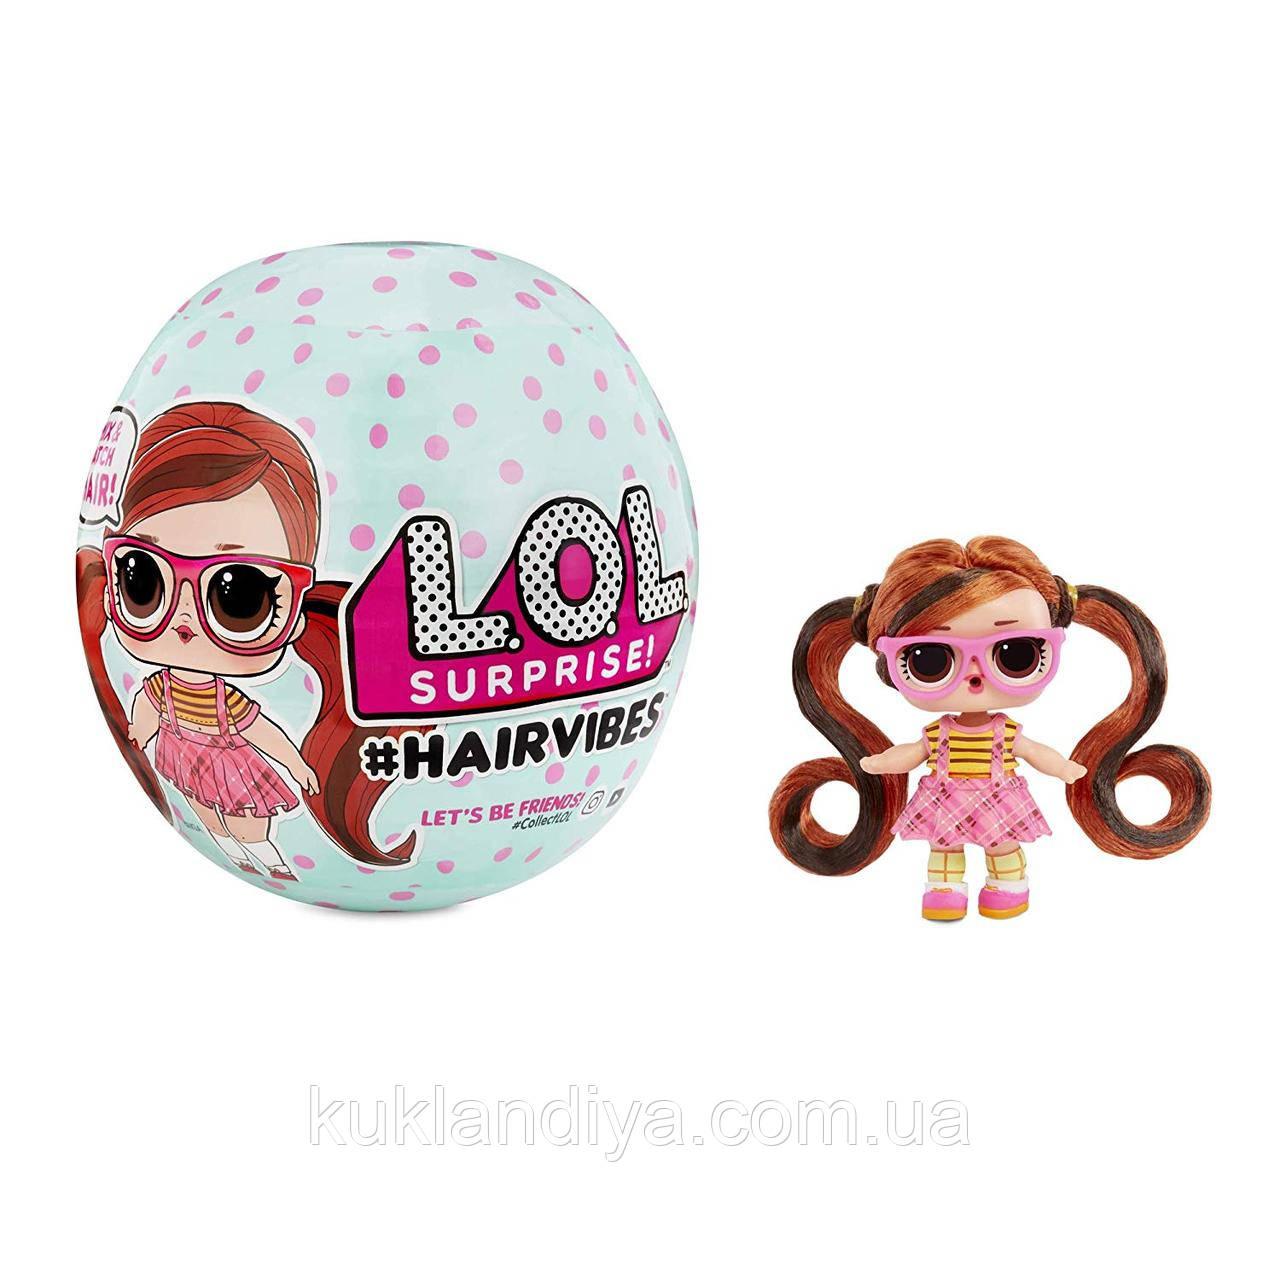 L.O.L. Surprise Hairvibes Кукла лол со сменными париками